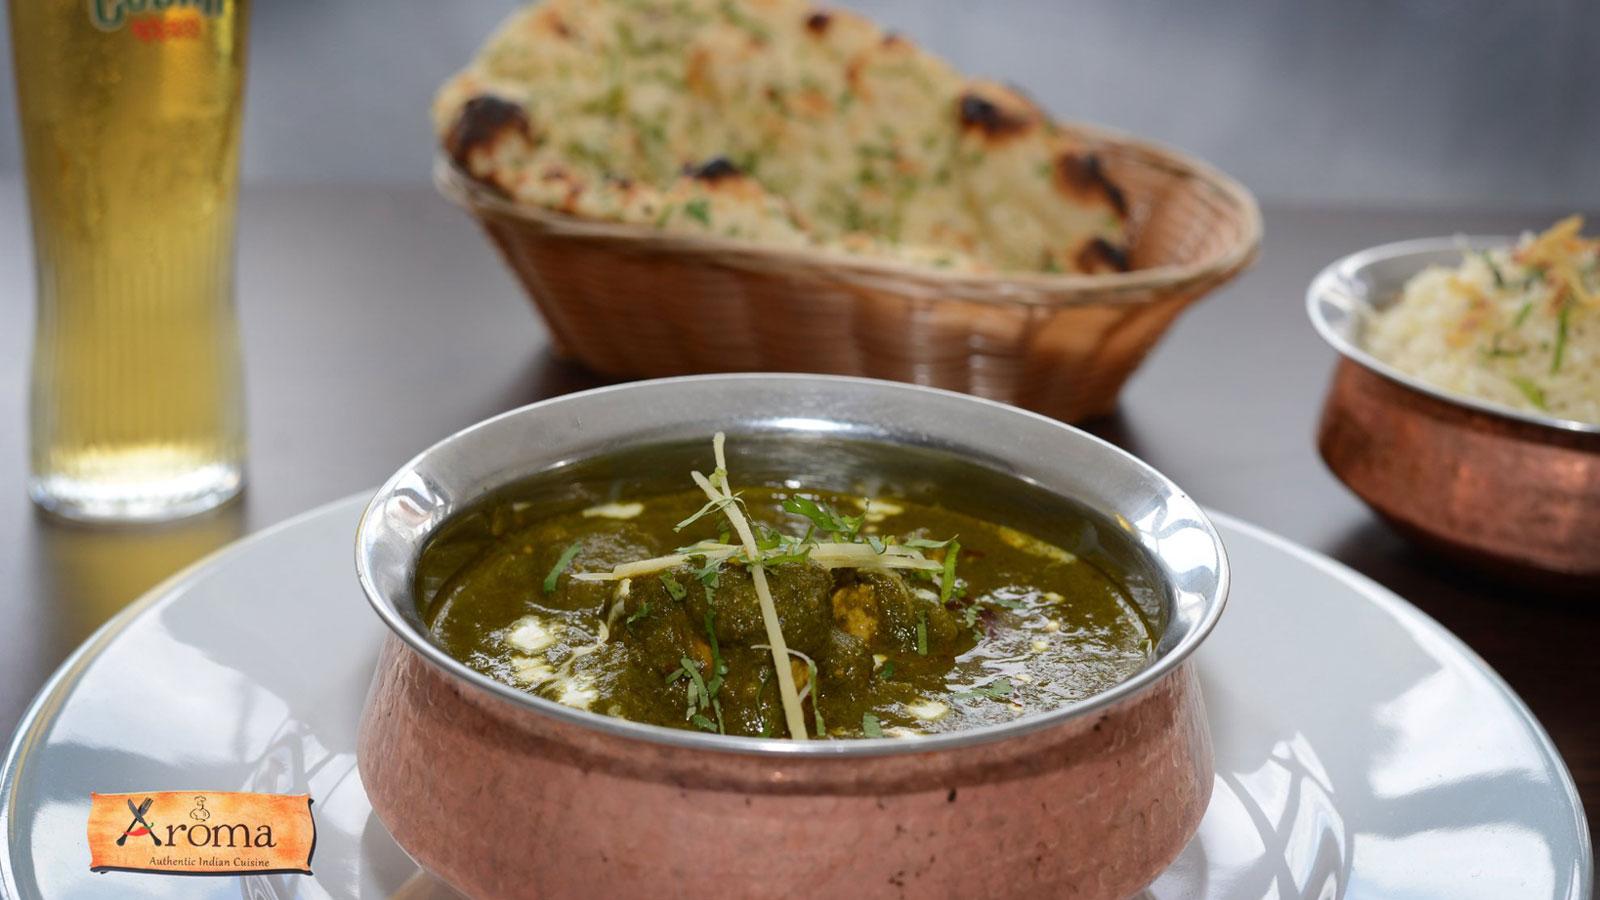 Superb Aroma Authentic Indian Cuisine Best Indian Restaurant In Download Free Architecture Designs Ogrambritishbridgeorg